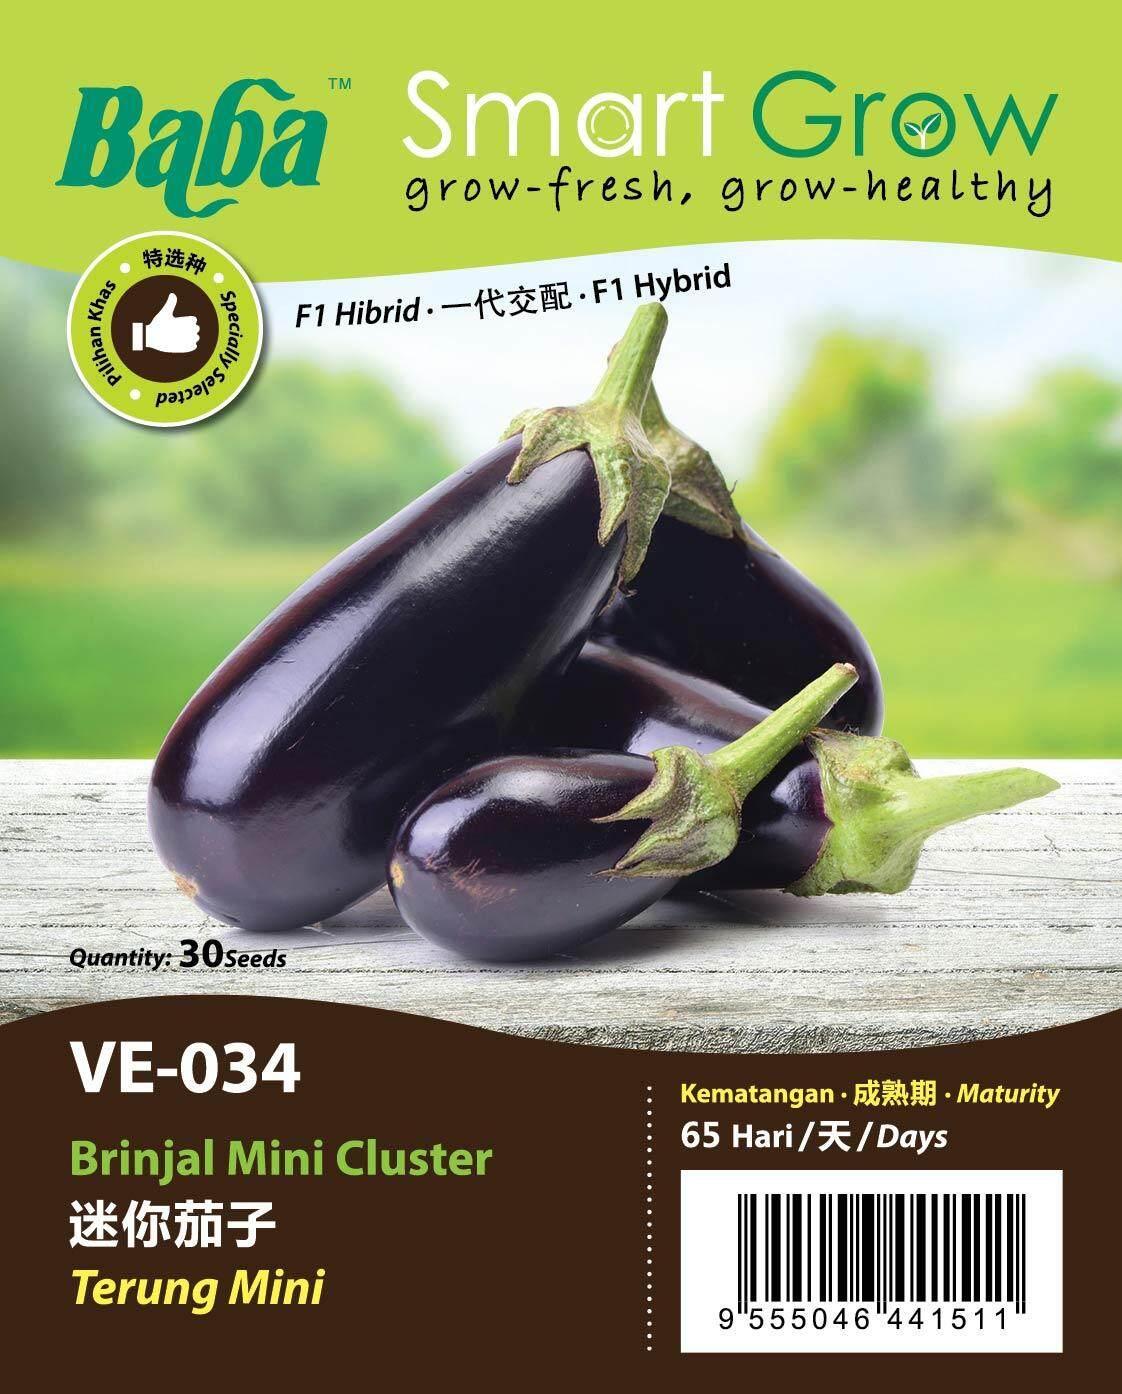 Baba Smart Grow - Brinjal mini Cluster 迷你茄子